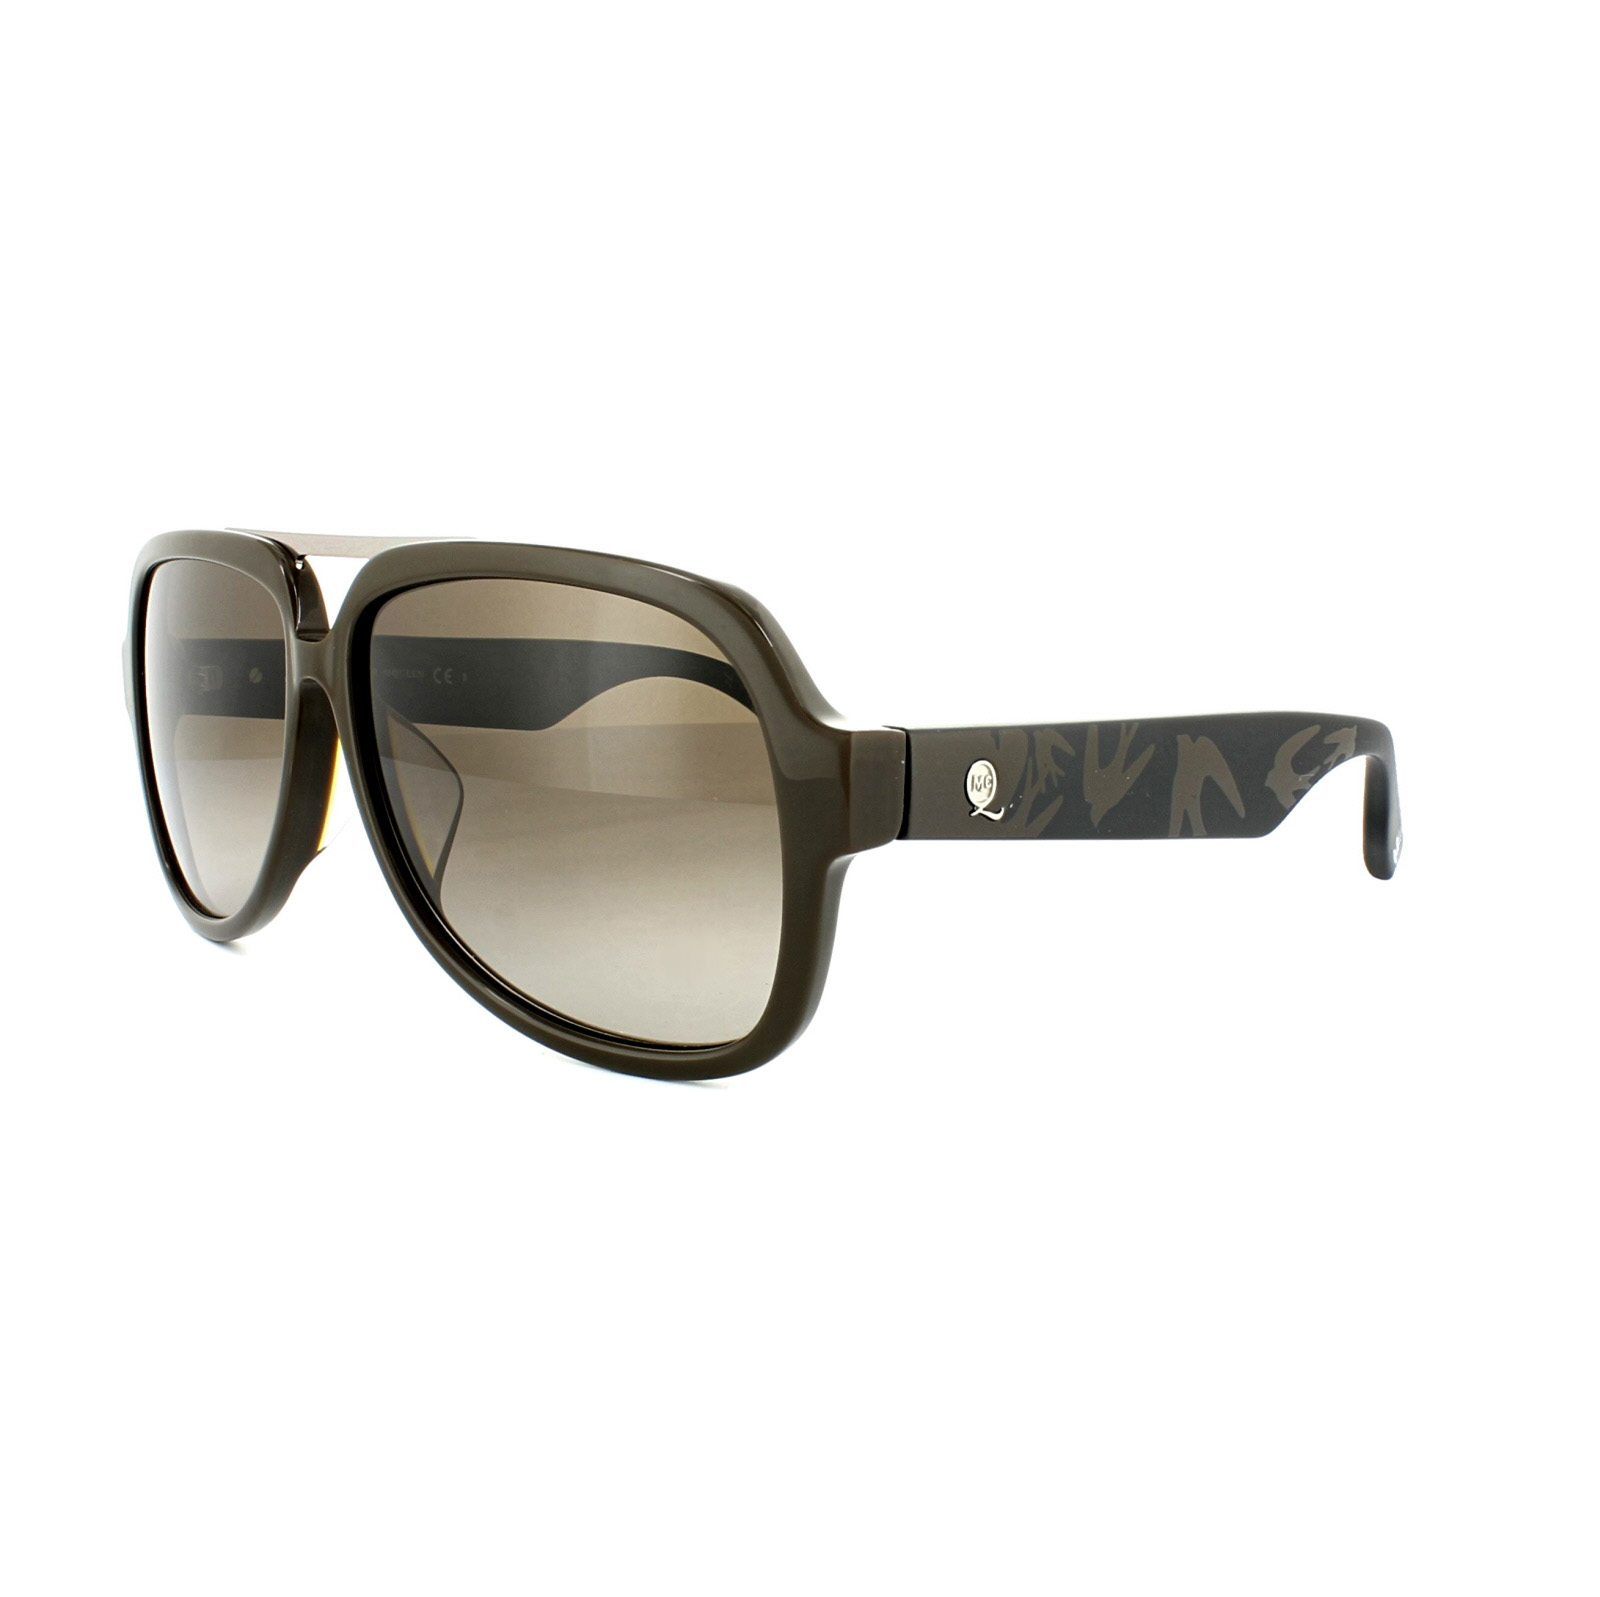 Mcq Sunglasses  mcq alexander mcqueen sunglasses 0040 f s slz blue crystal grey ebay